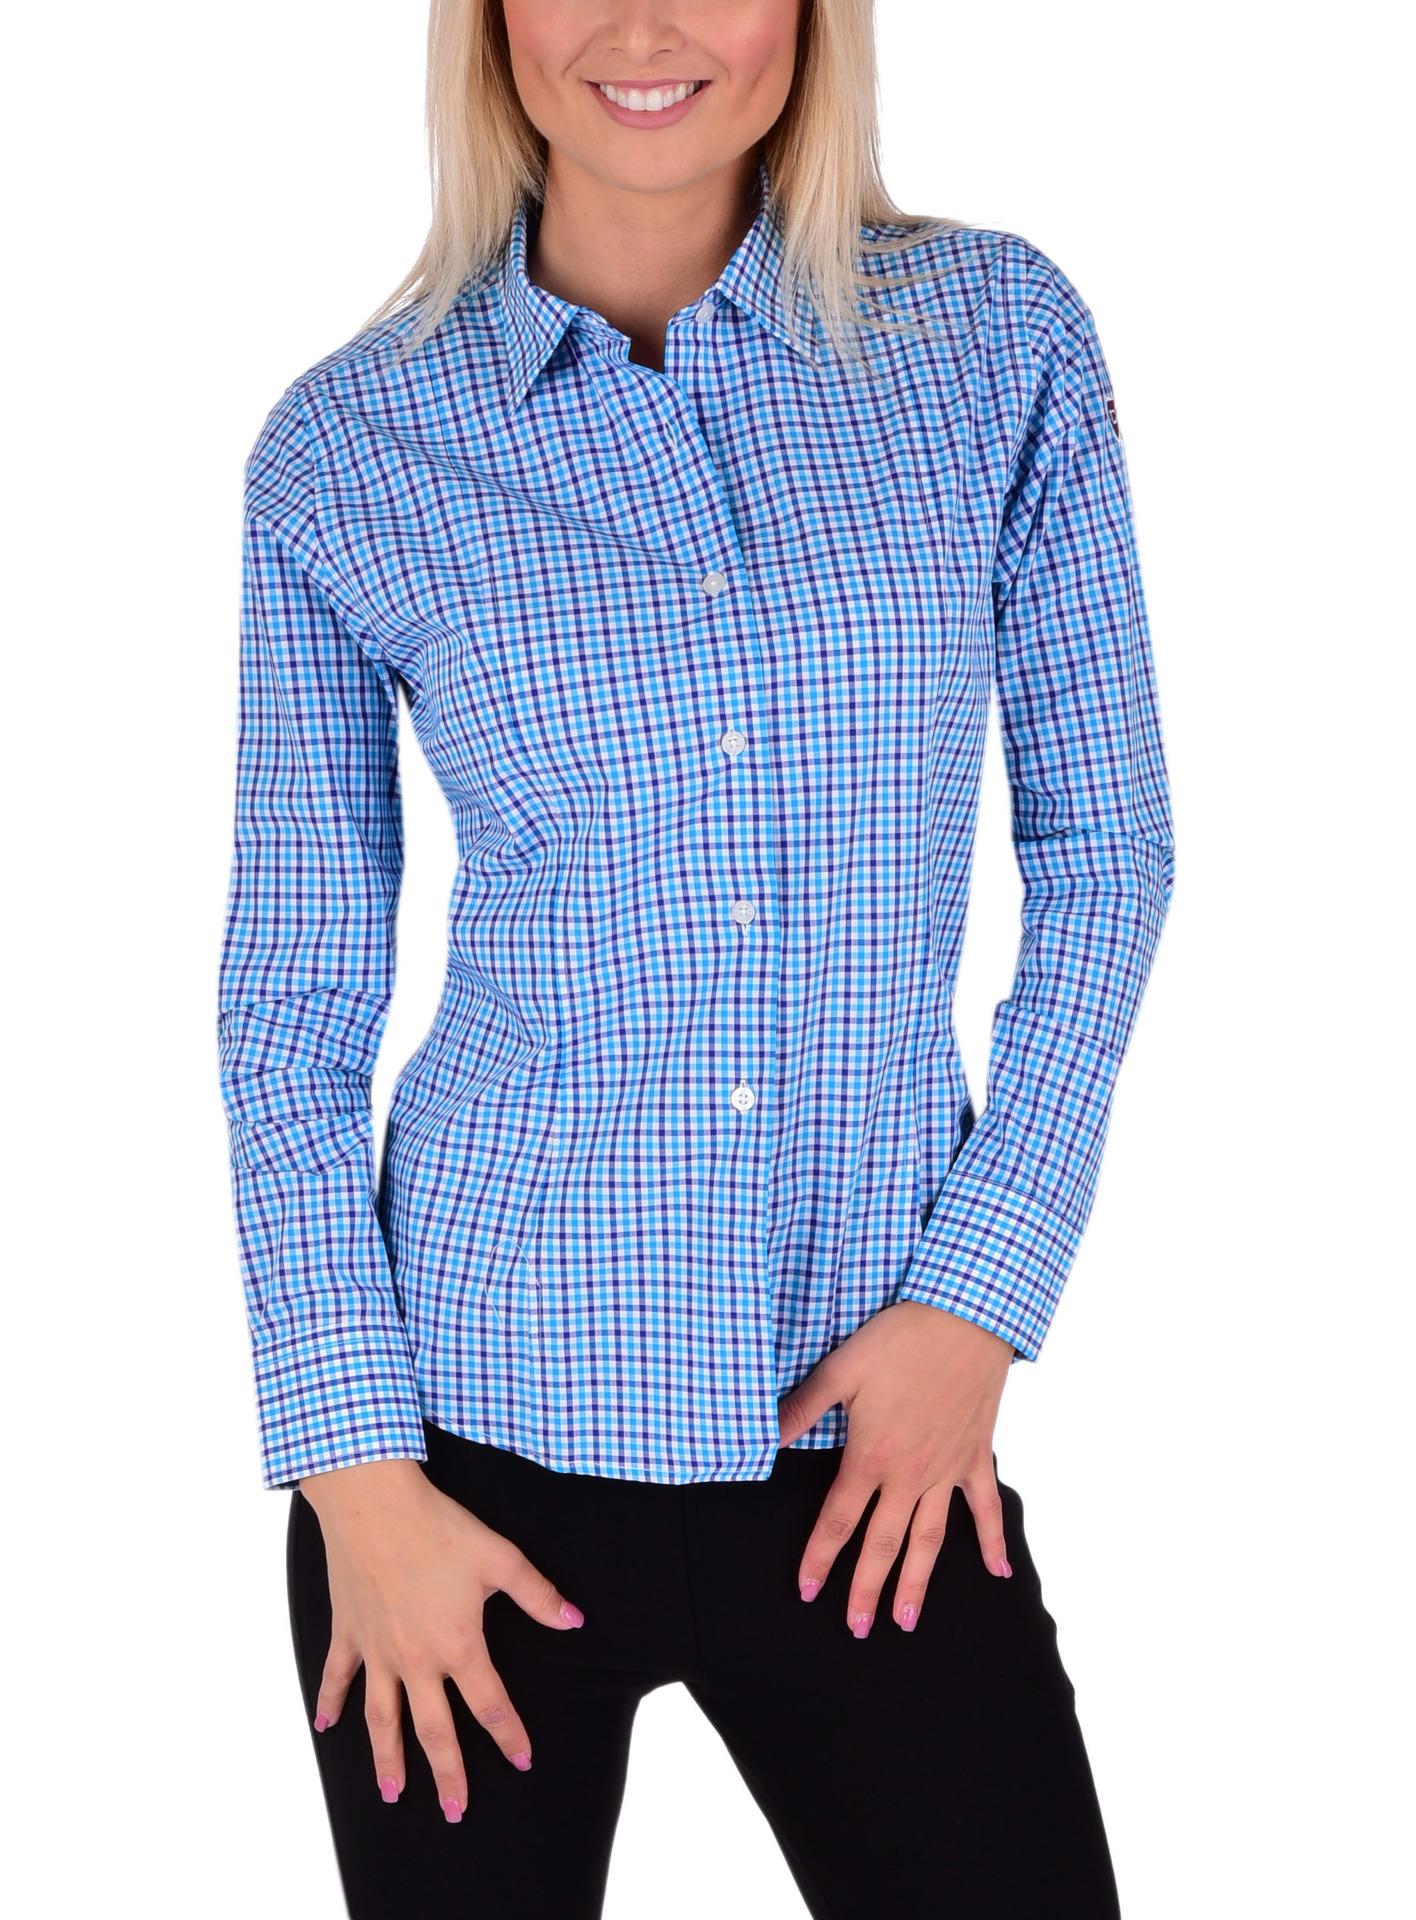 SOPHIA košile  slim fit s dlouhým rukávem blue caro  XXL